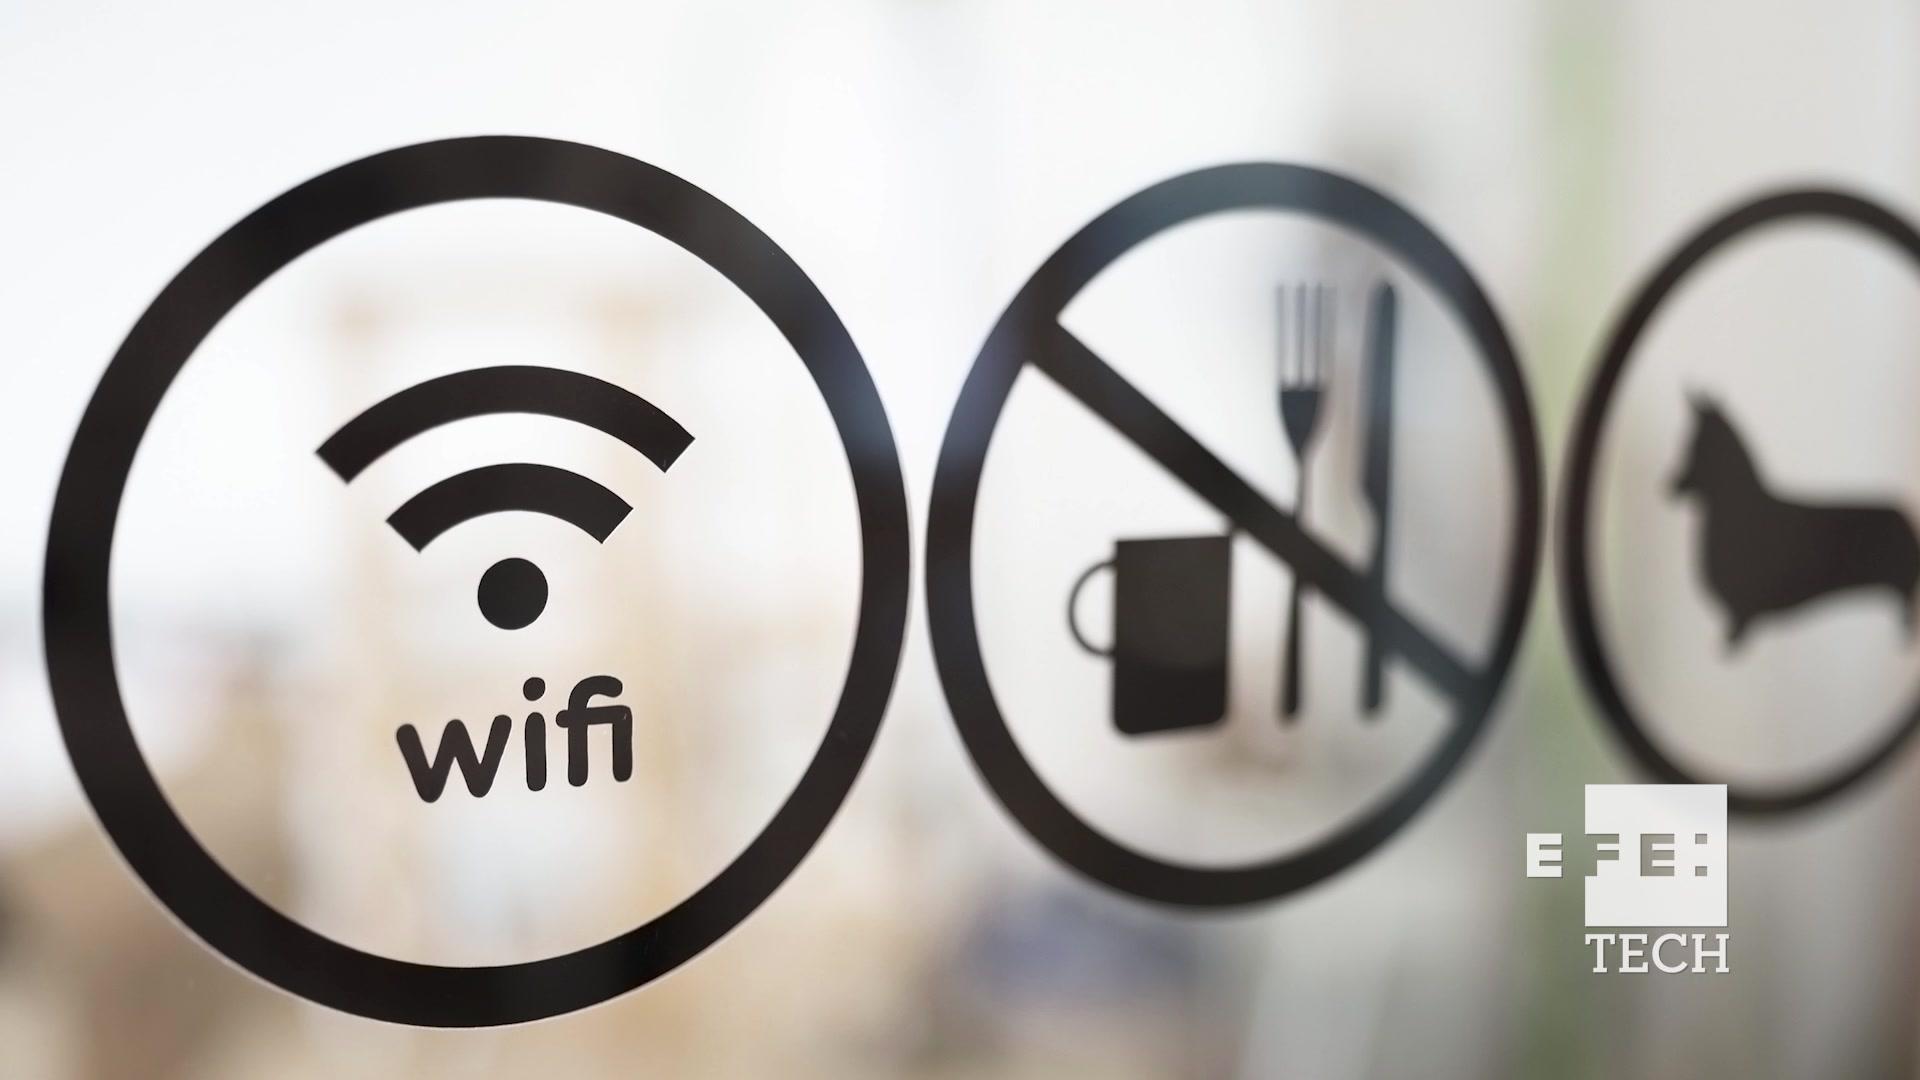 It's a Wi-Fi World with ProjectFi